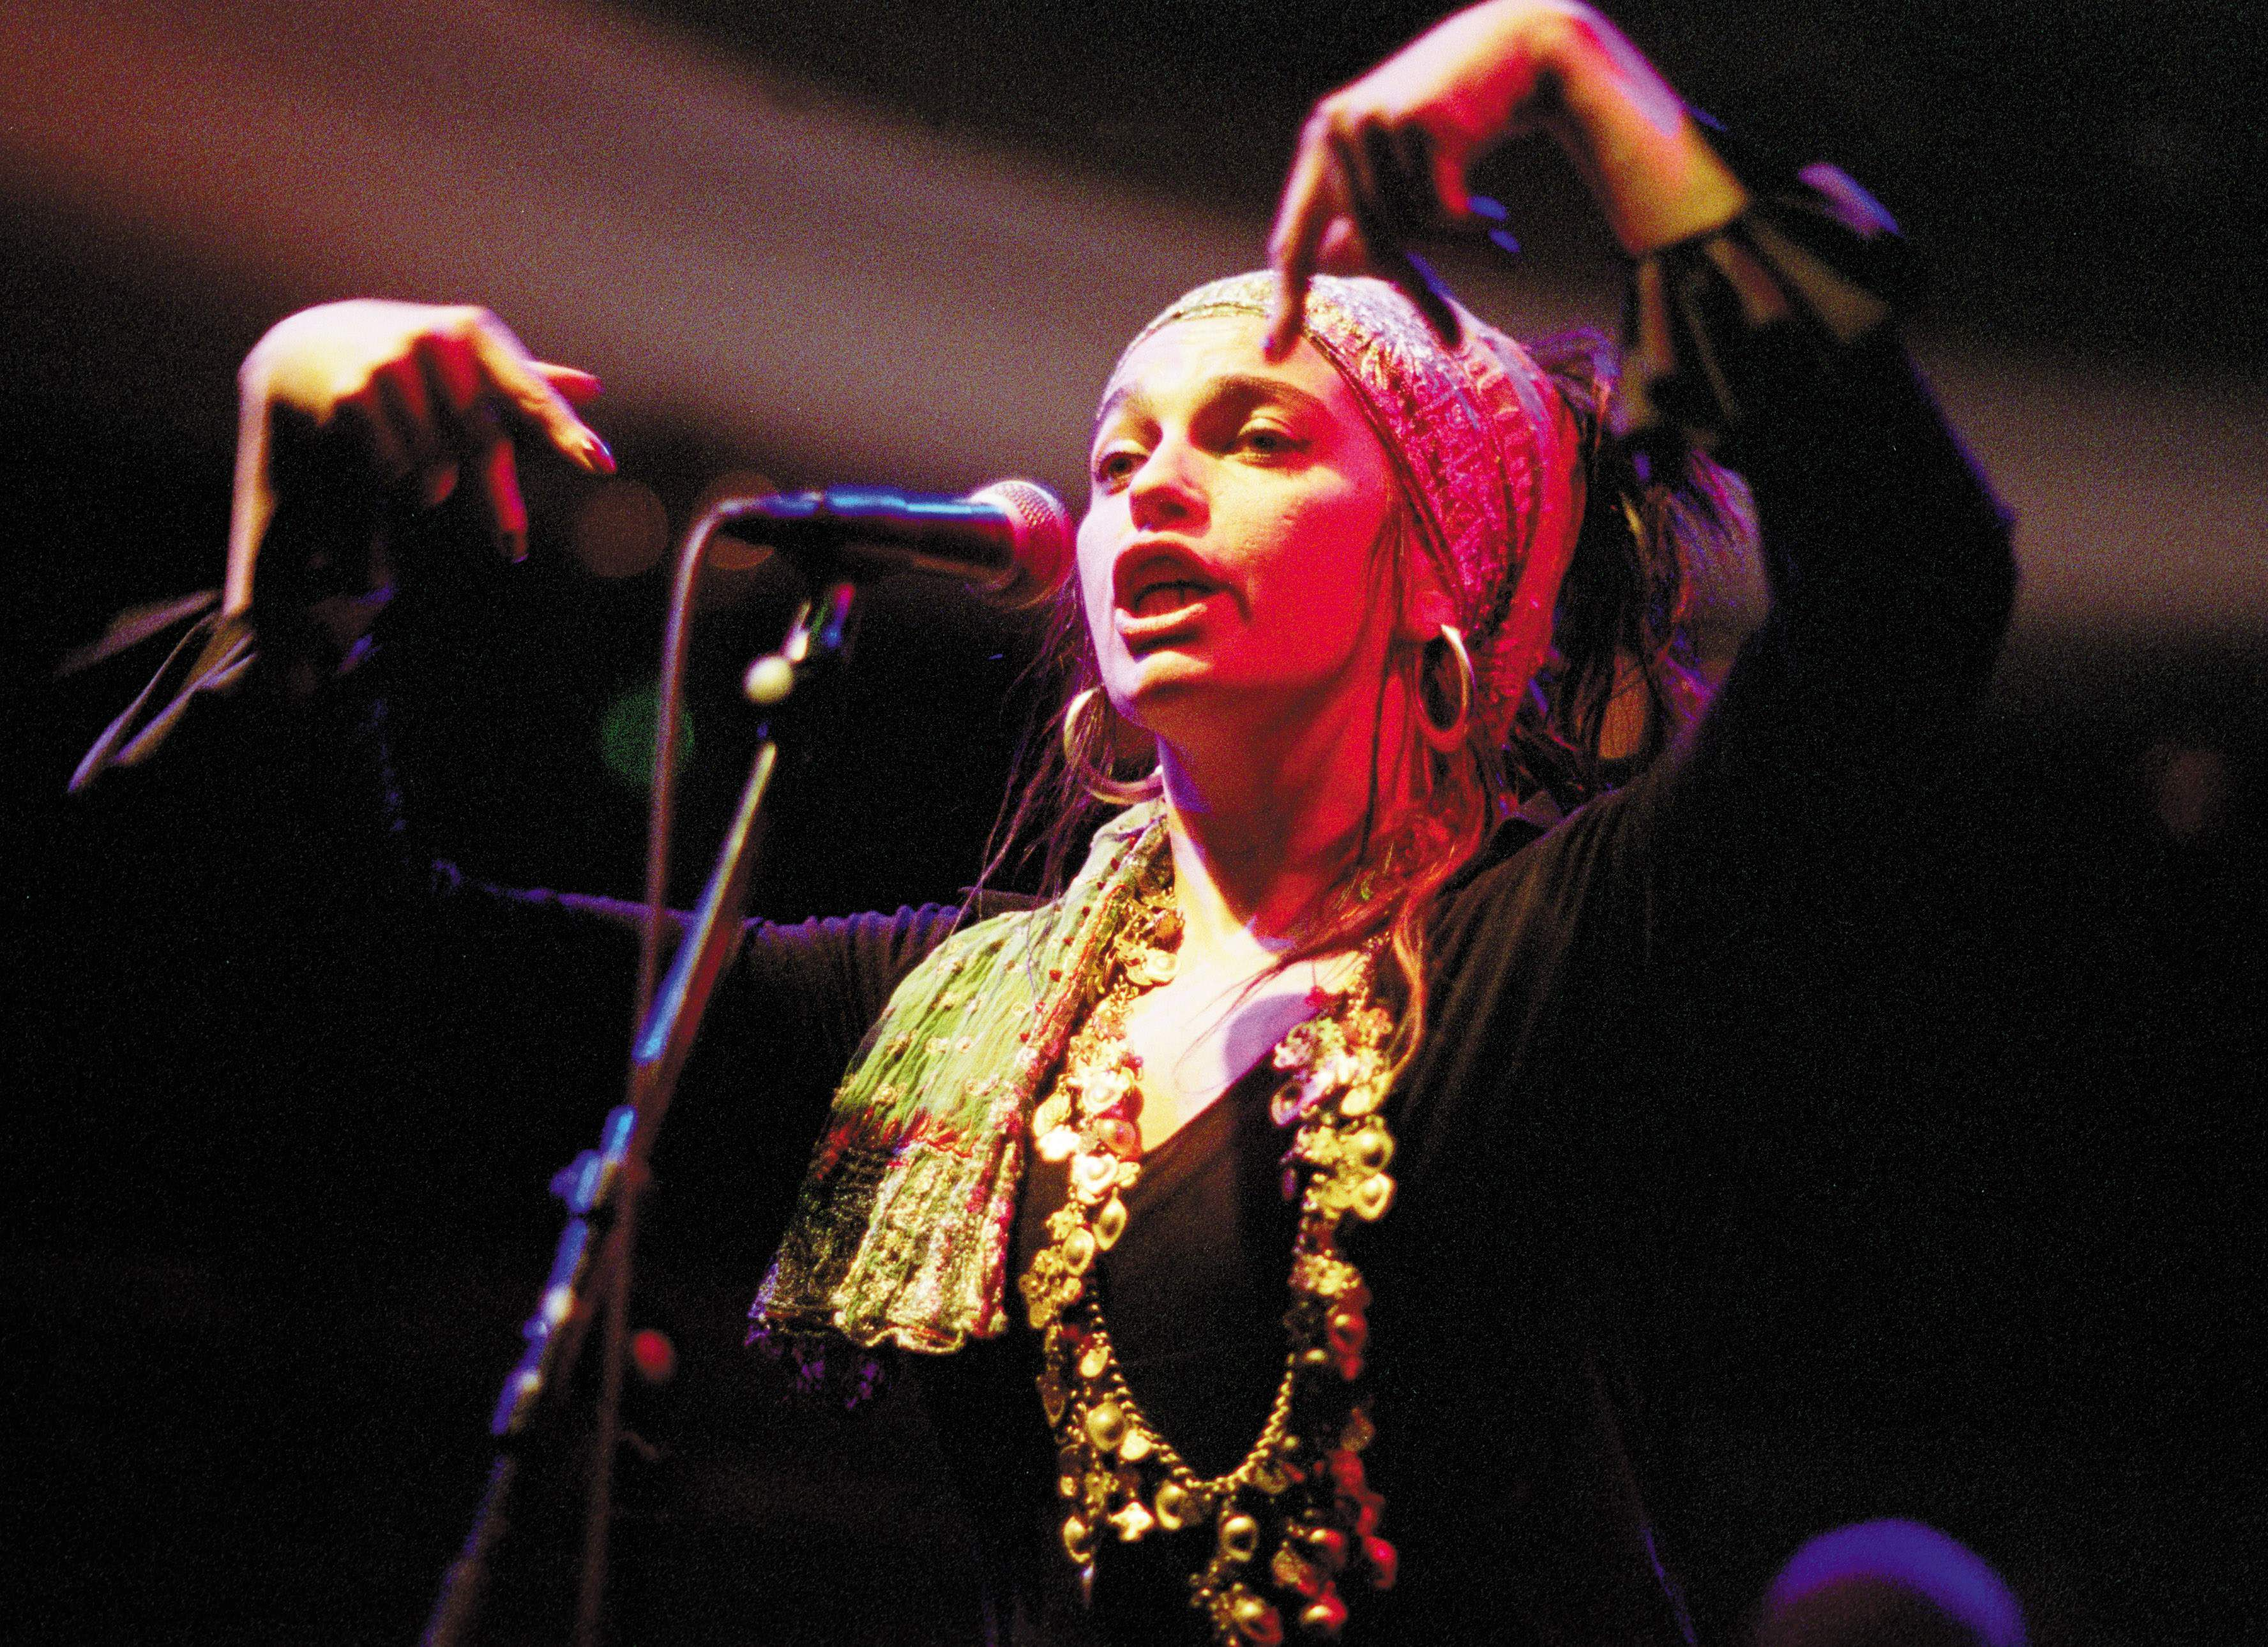 Spain's Top 5 Flamenco Artists